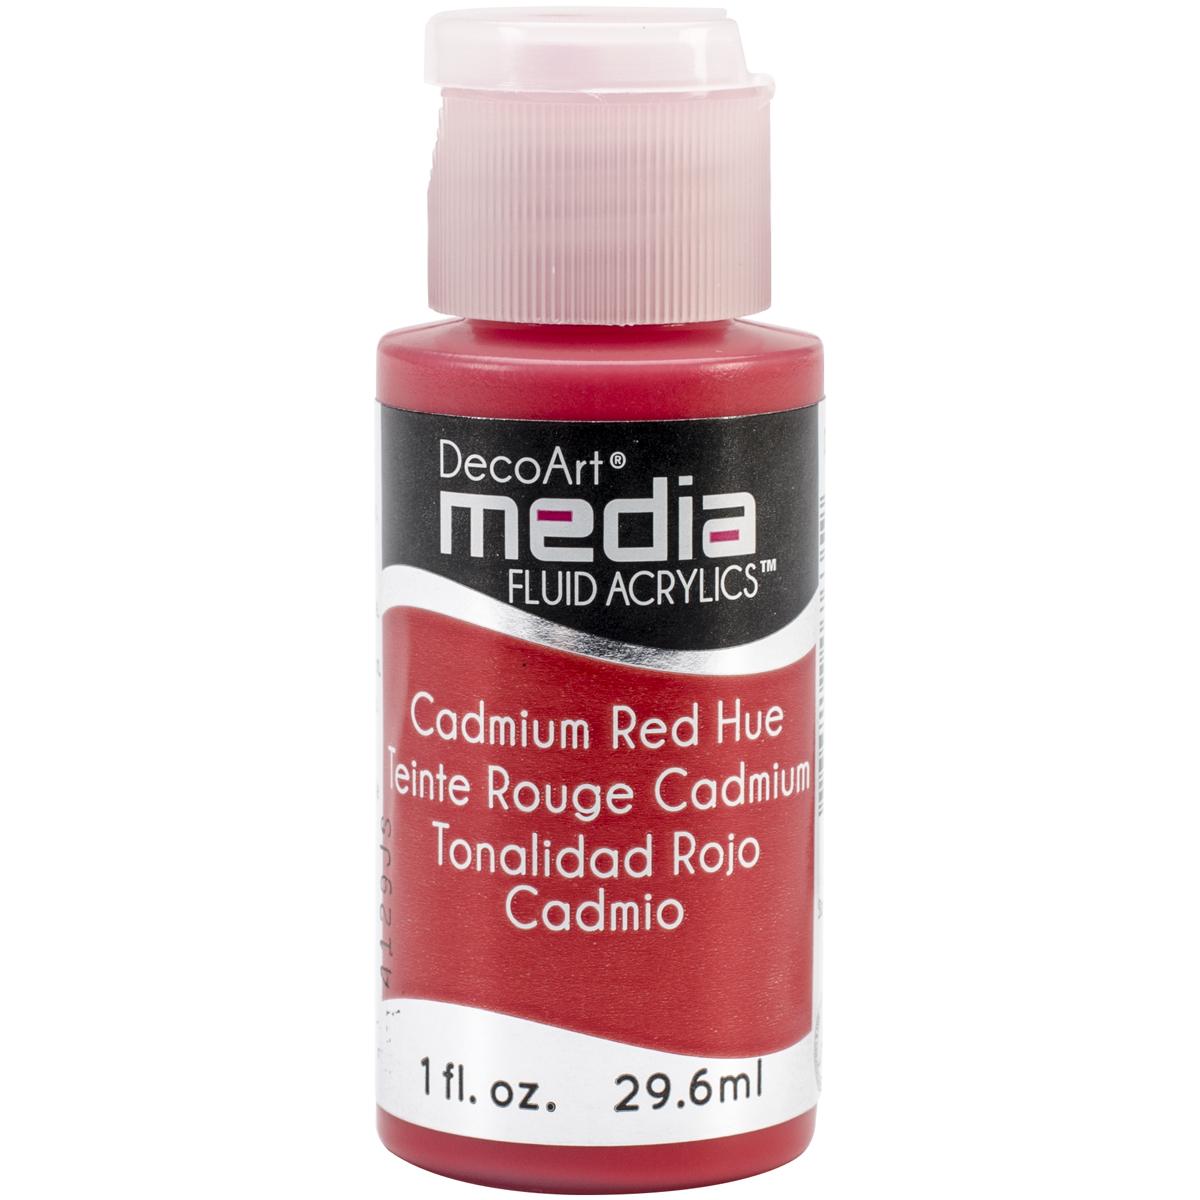 DecoArt Media Fluid Acrylics Paint 1oz-Cadmium Red (Series 3)